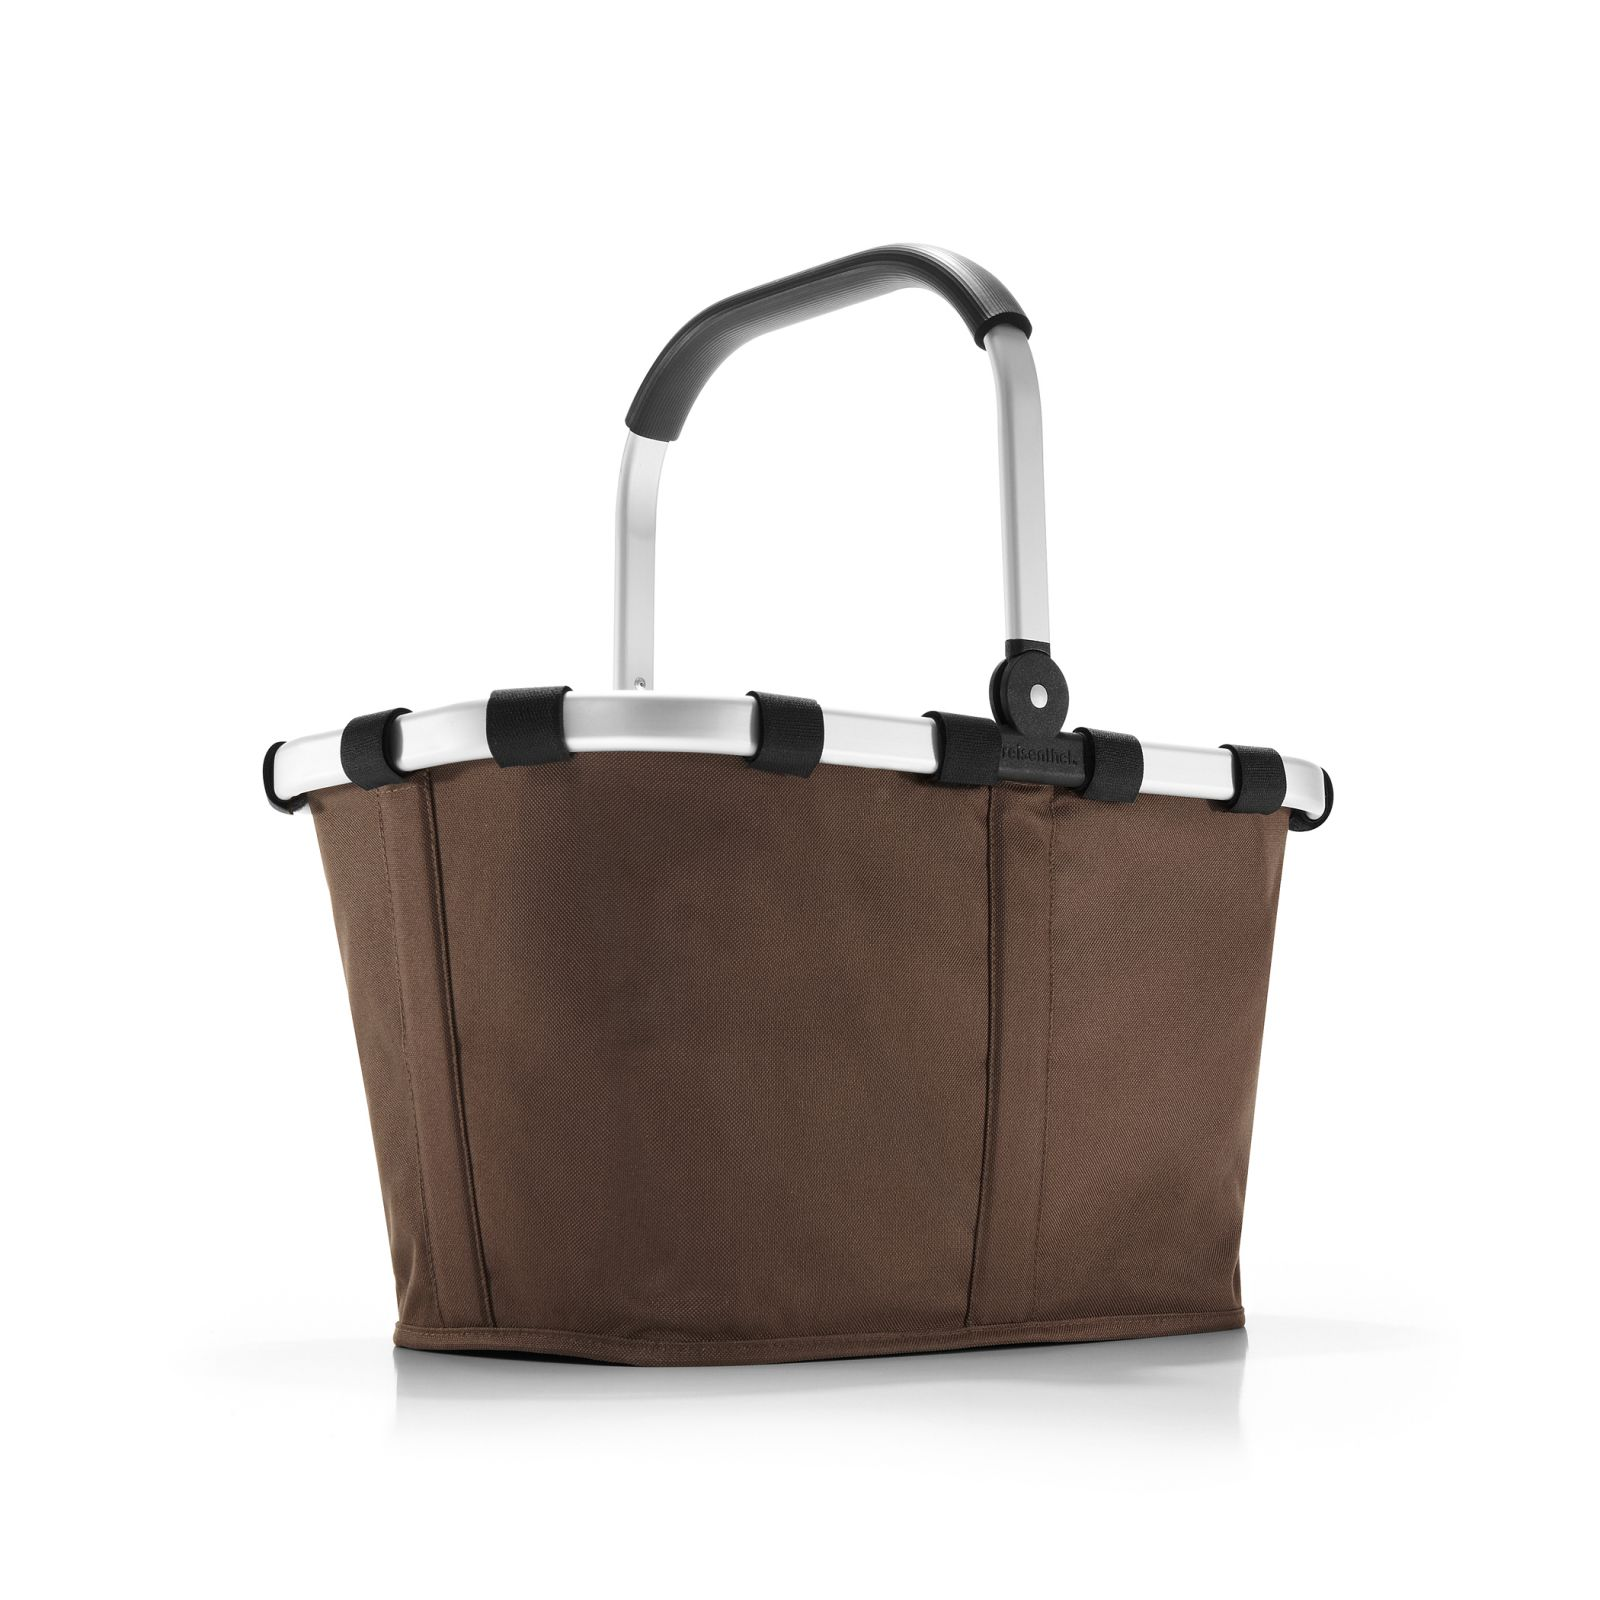 Reisenthel CarryBag Mocha E-batoh